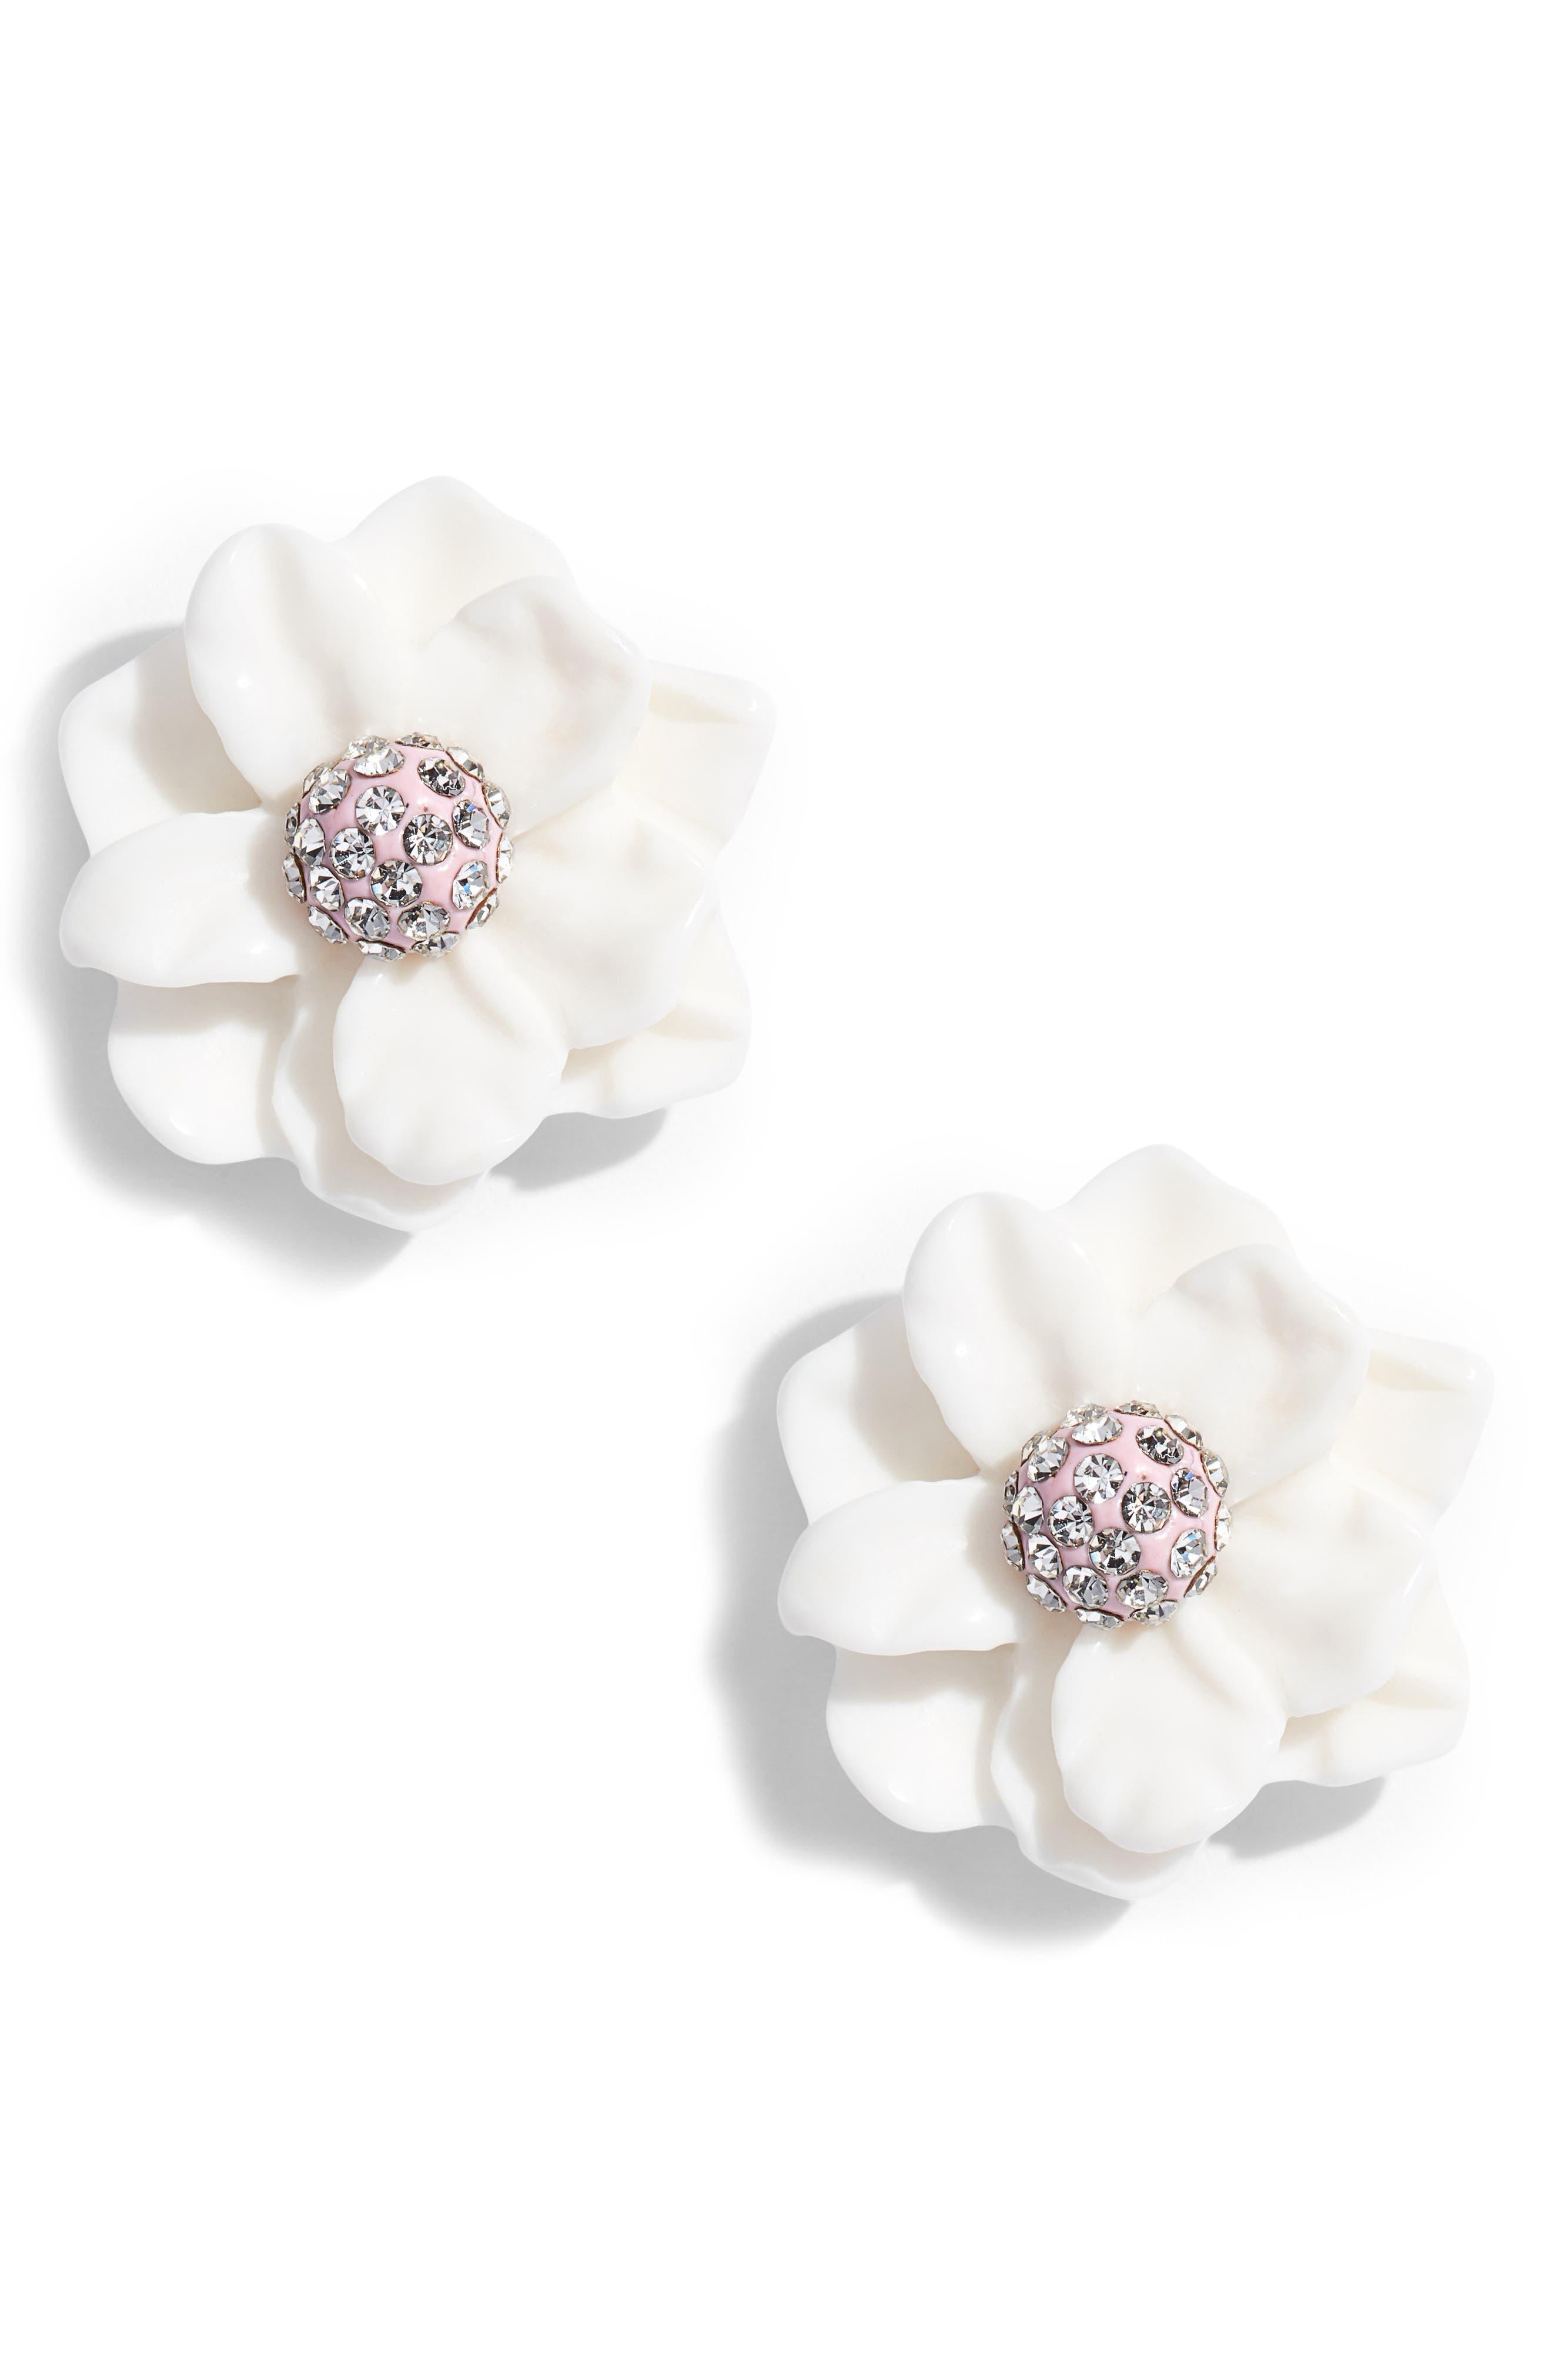 Gardenia Stud Earrings,                             Main thumbnail 1, color,                             Ivory